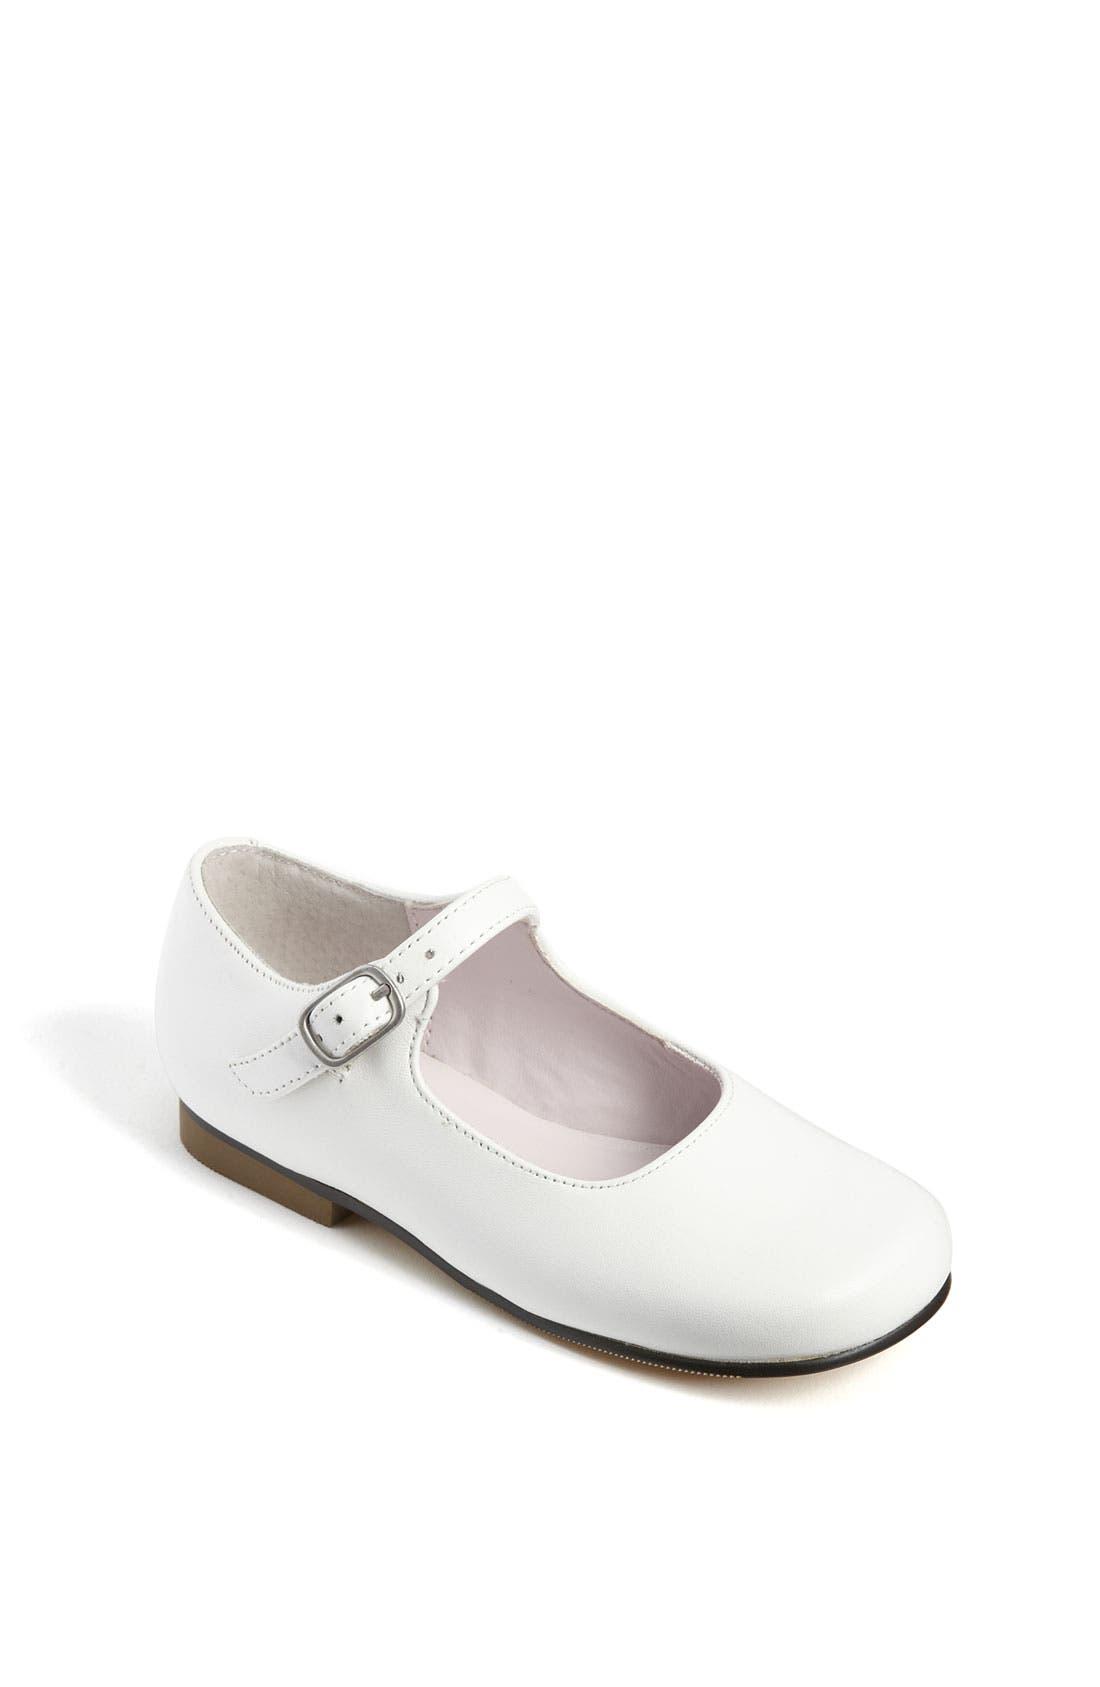 'Bonnett' Mary Jane,                             Main thumbnail 1, color,                             White Leather